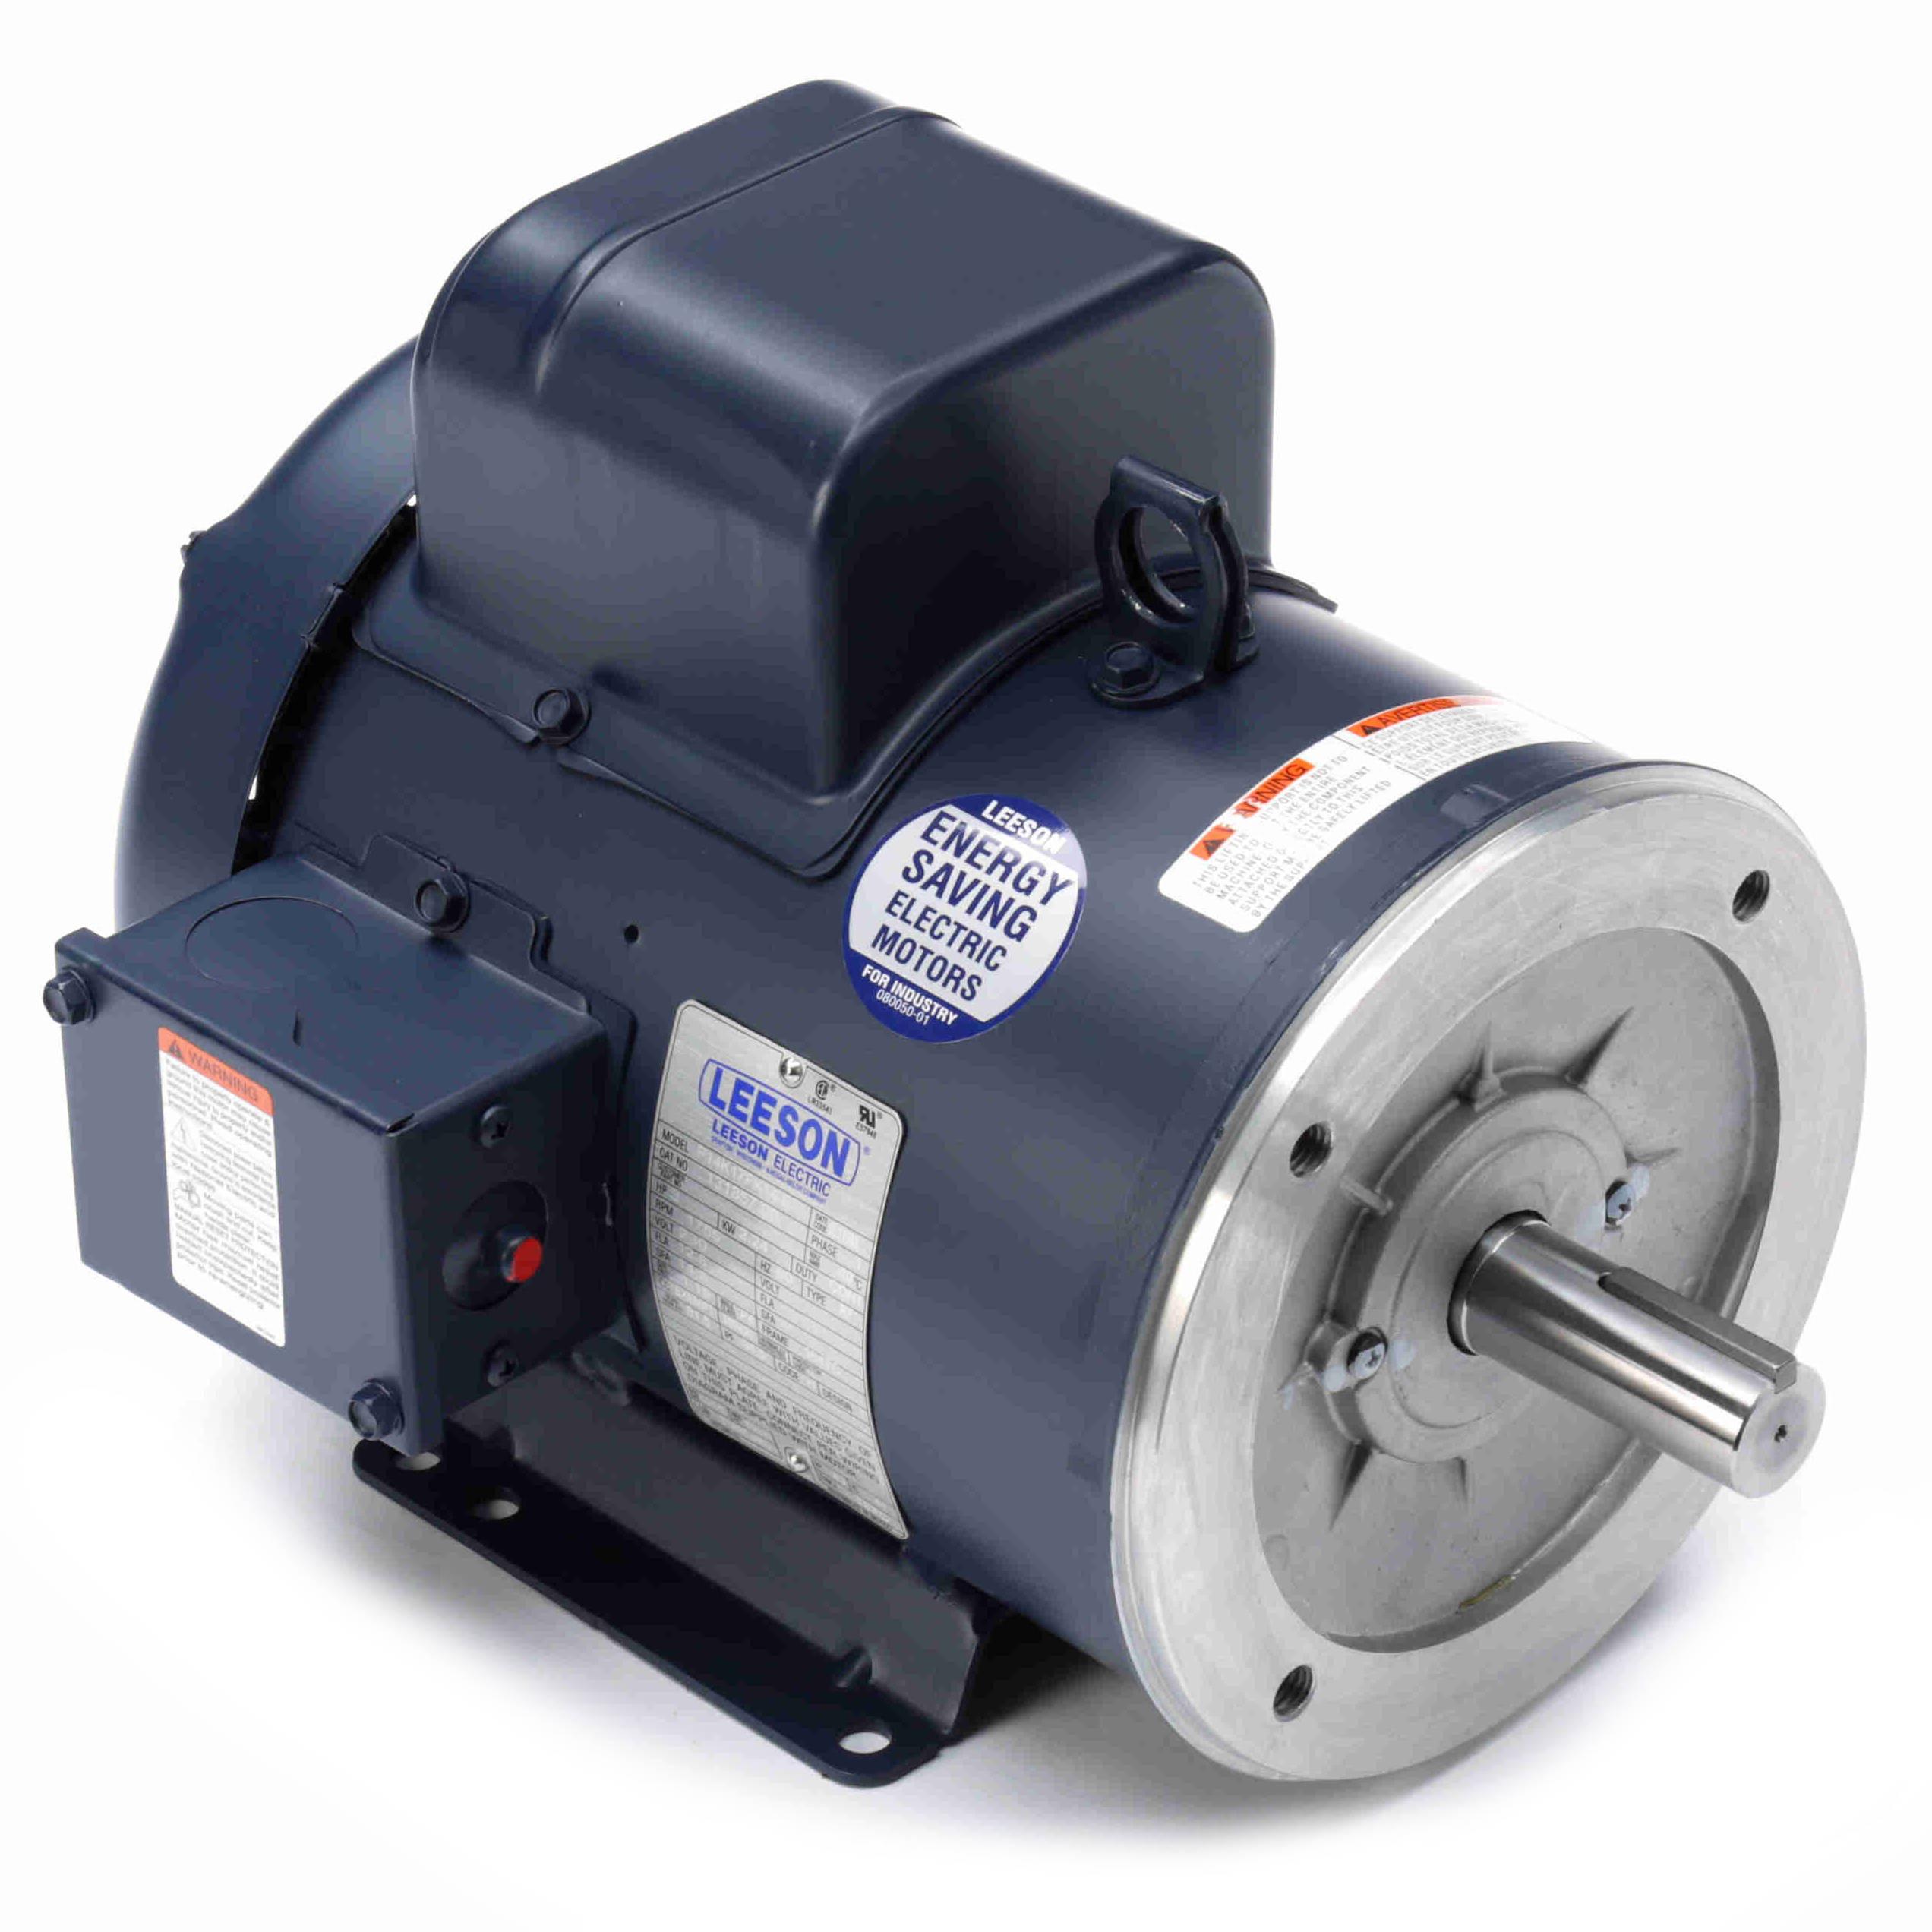 13185700 Leeson 3hp Electric Motor 1800rpm Wiring Diagram General On 1